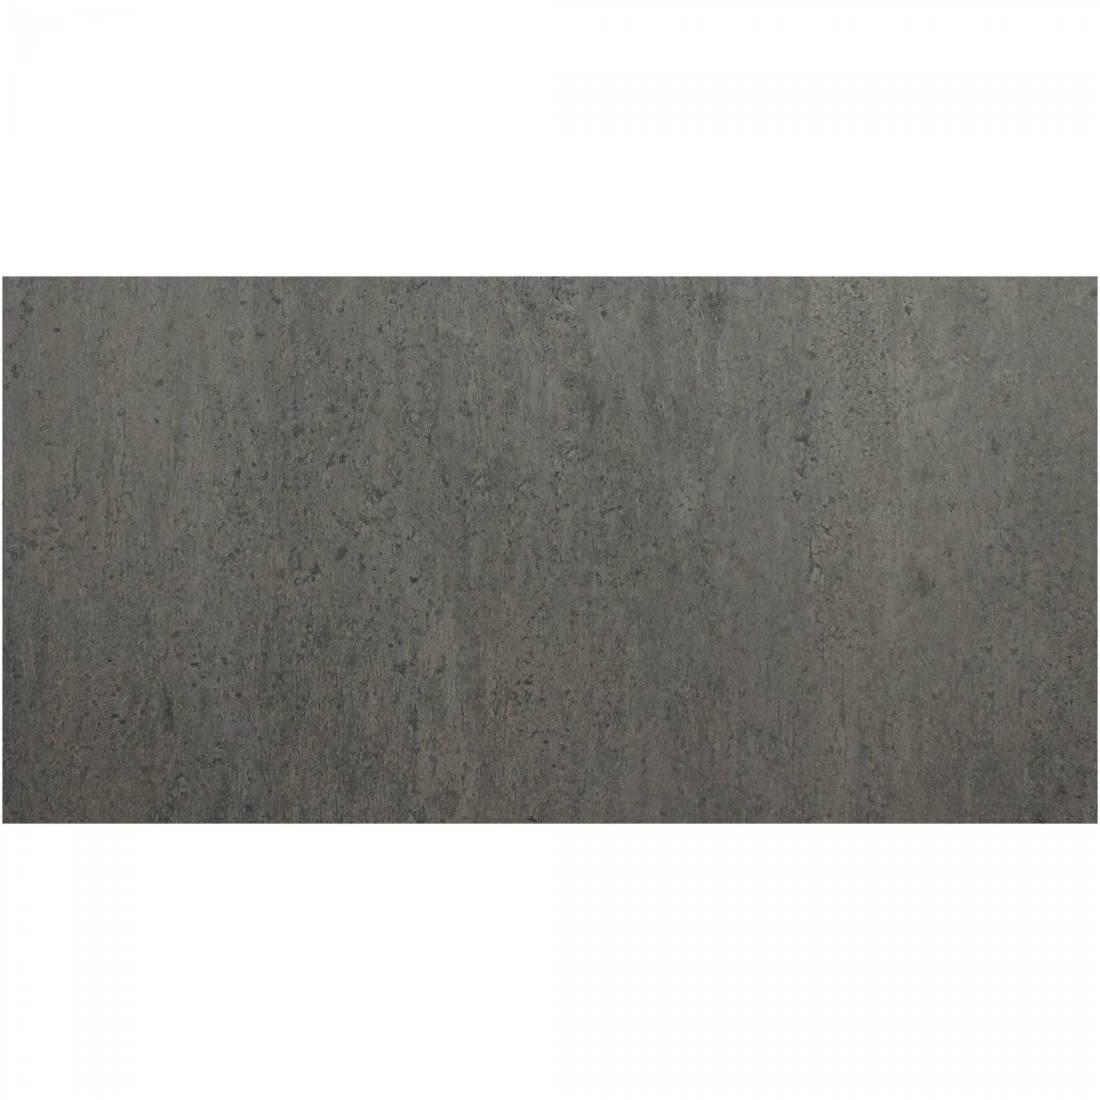 Cement No7 30x60 Black Matt 1